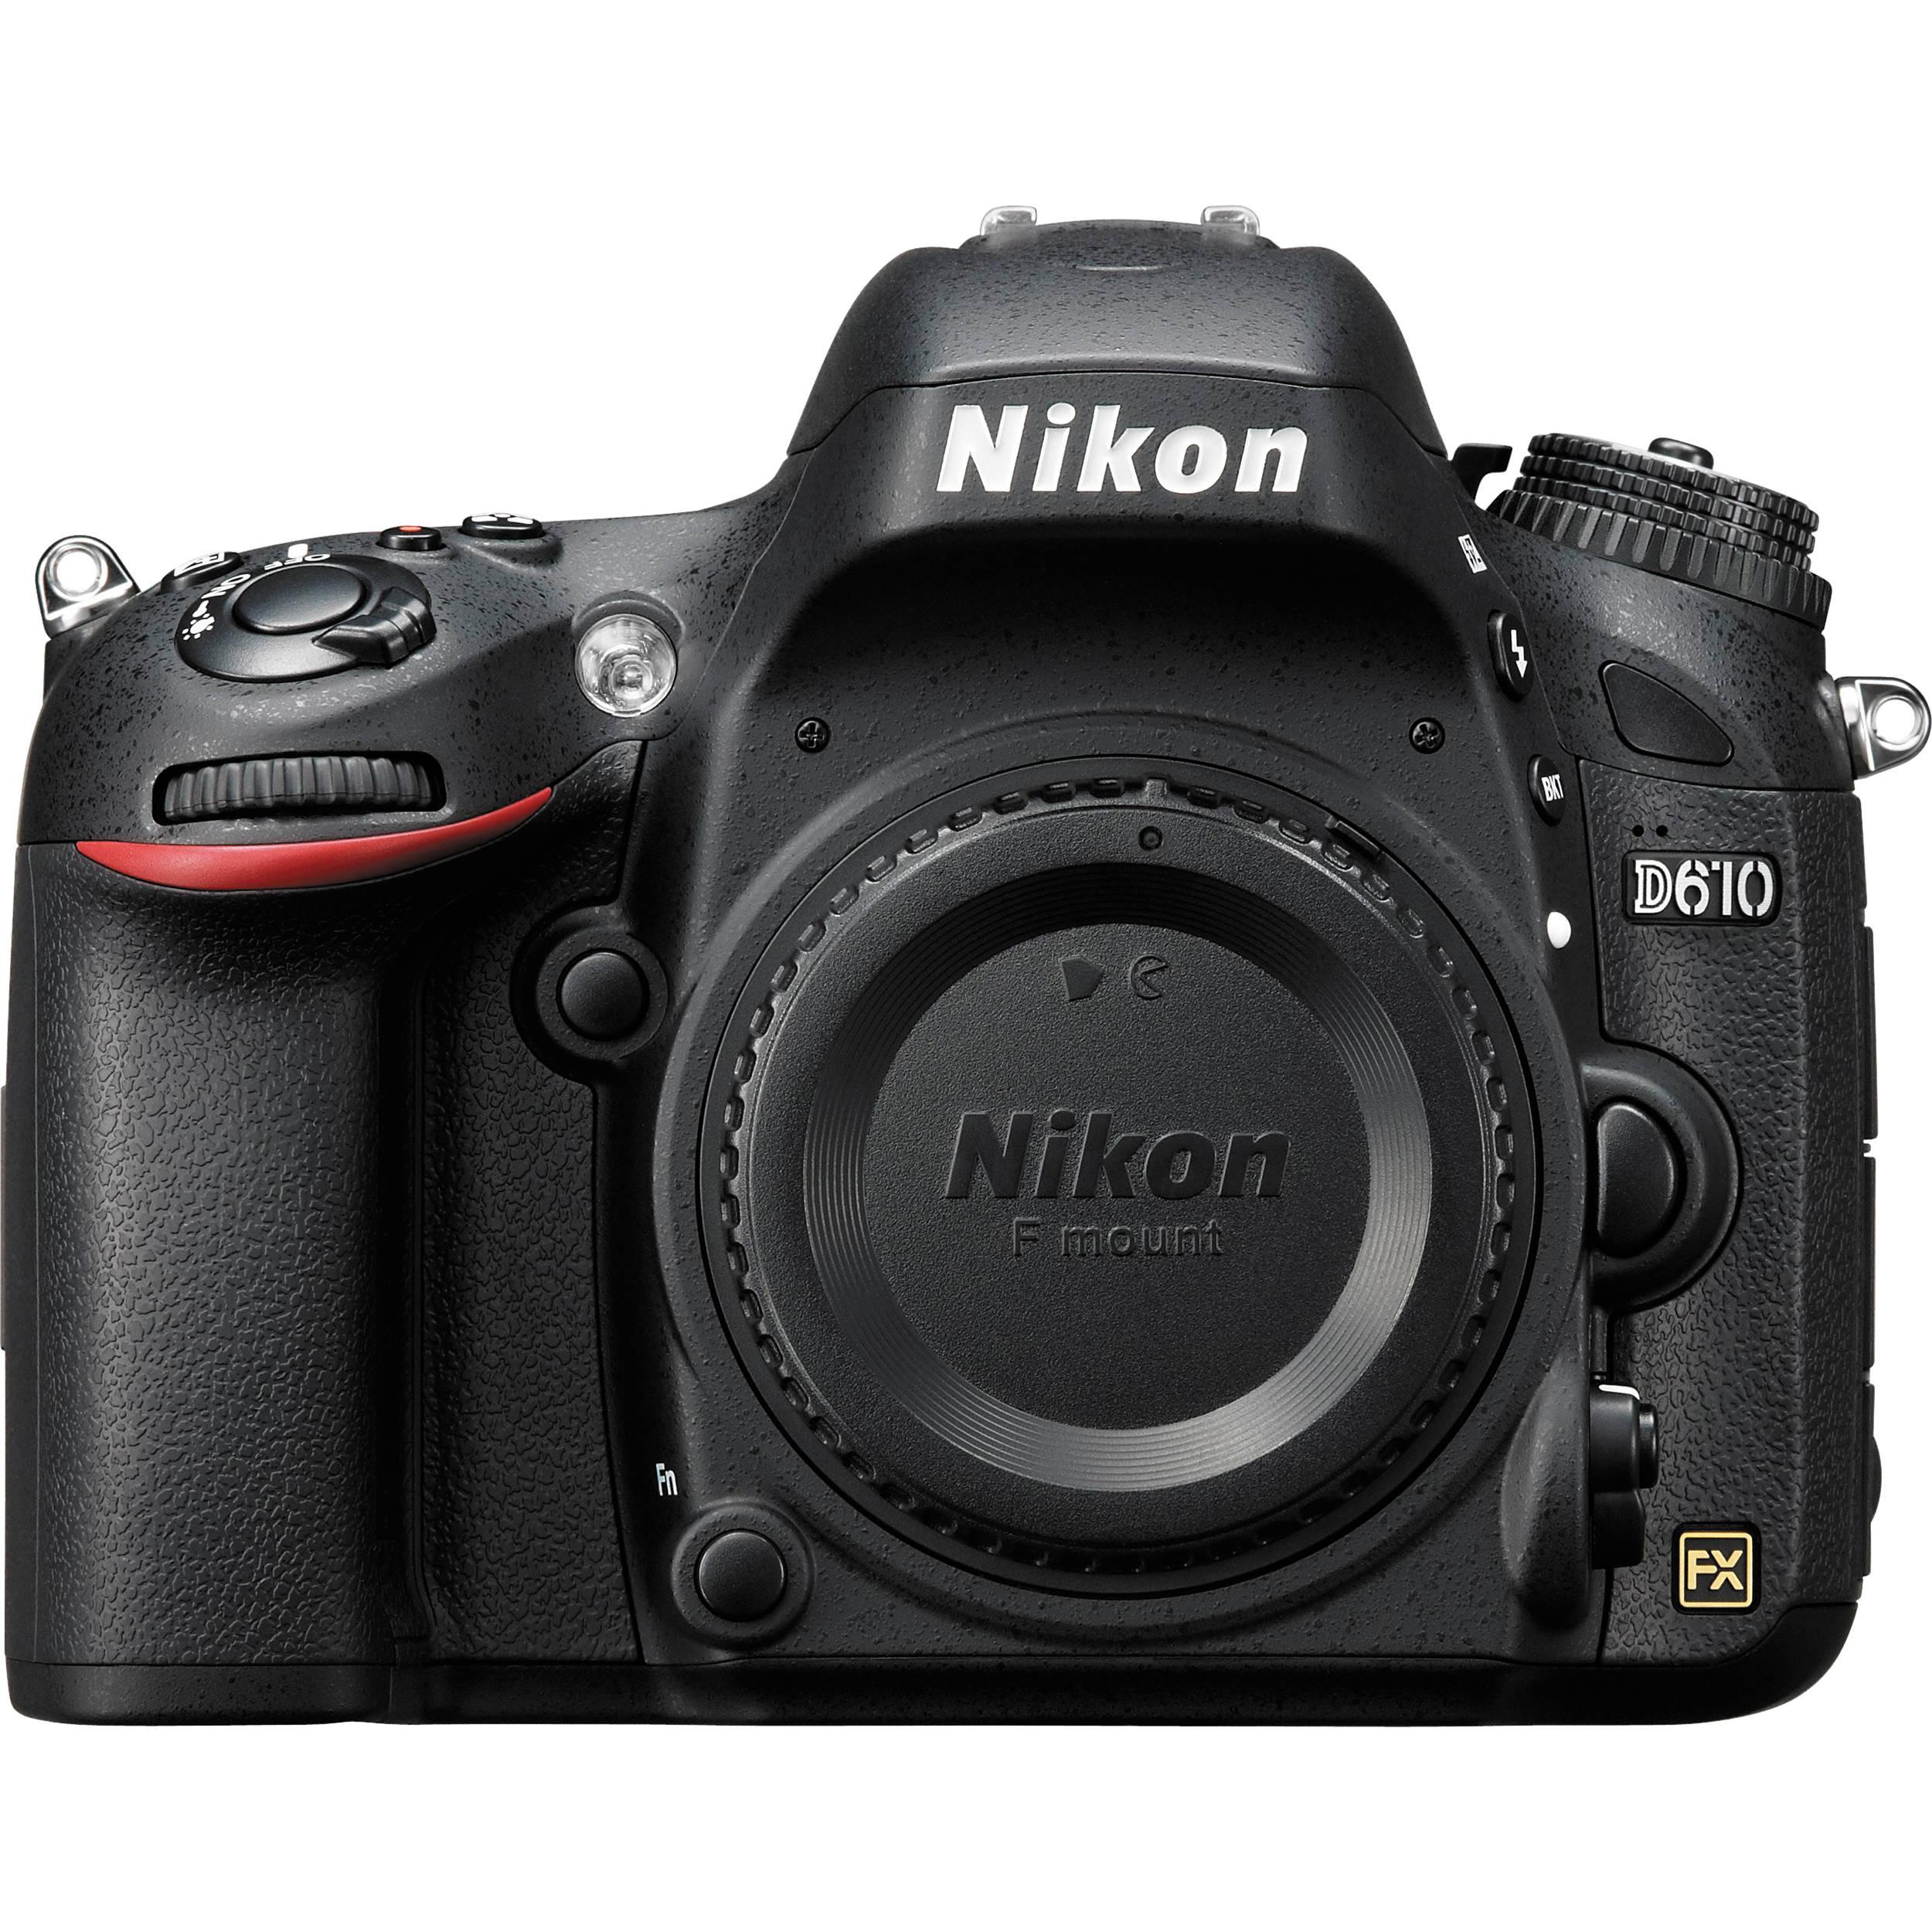 Nikon D610 DSLR Camera Body 1540 B&H Photo Video